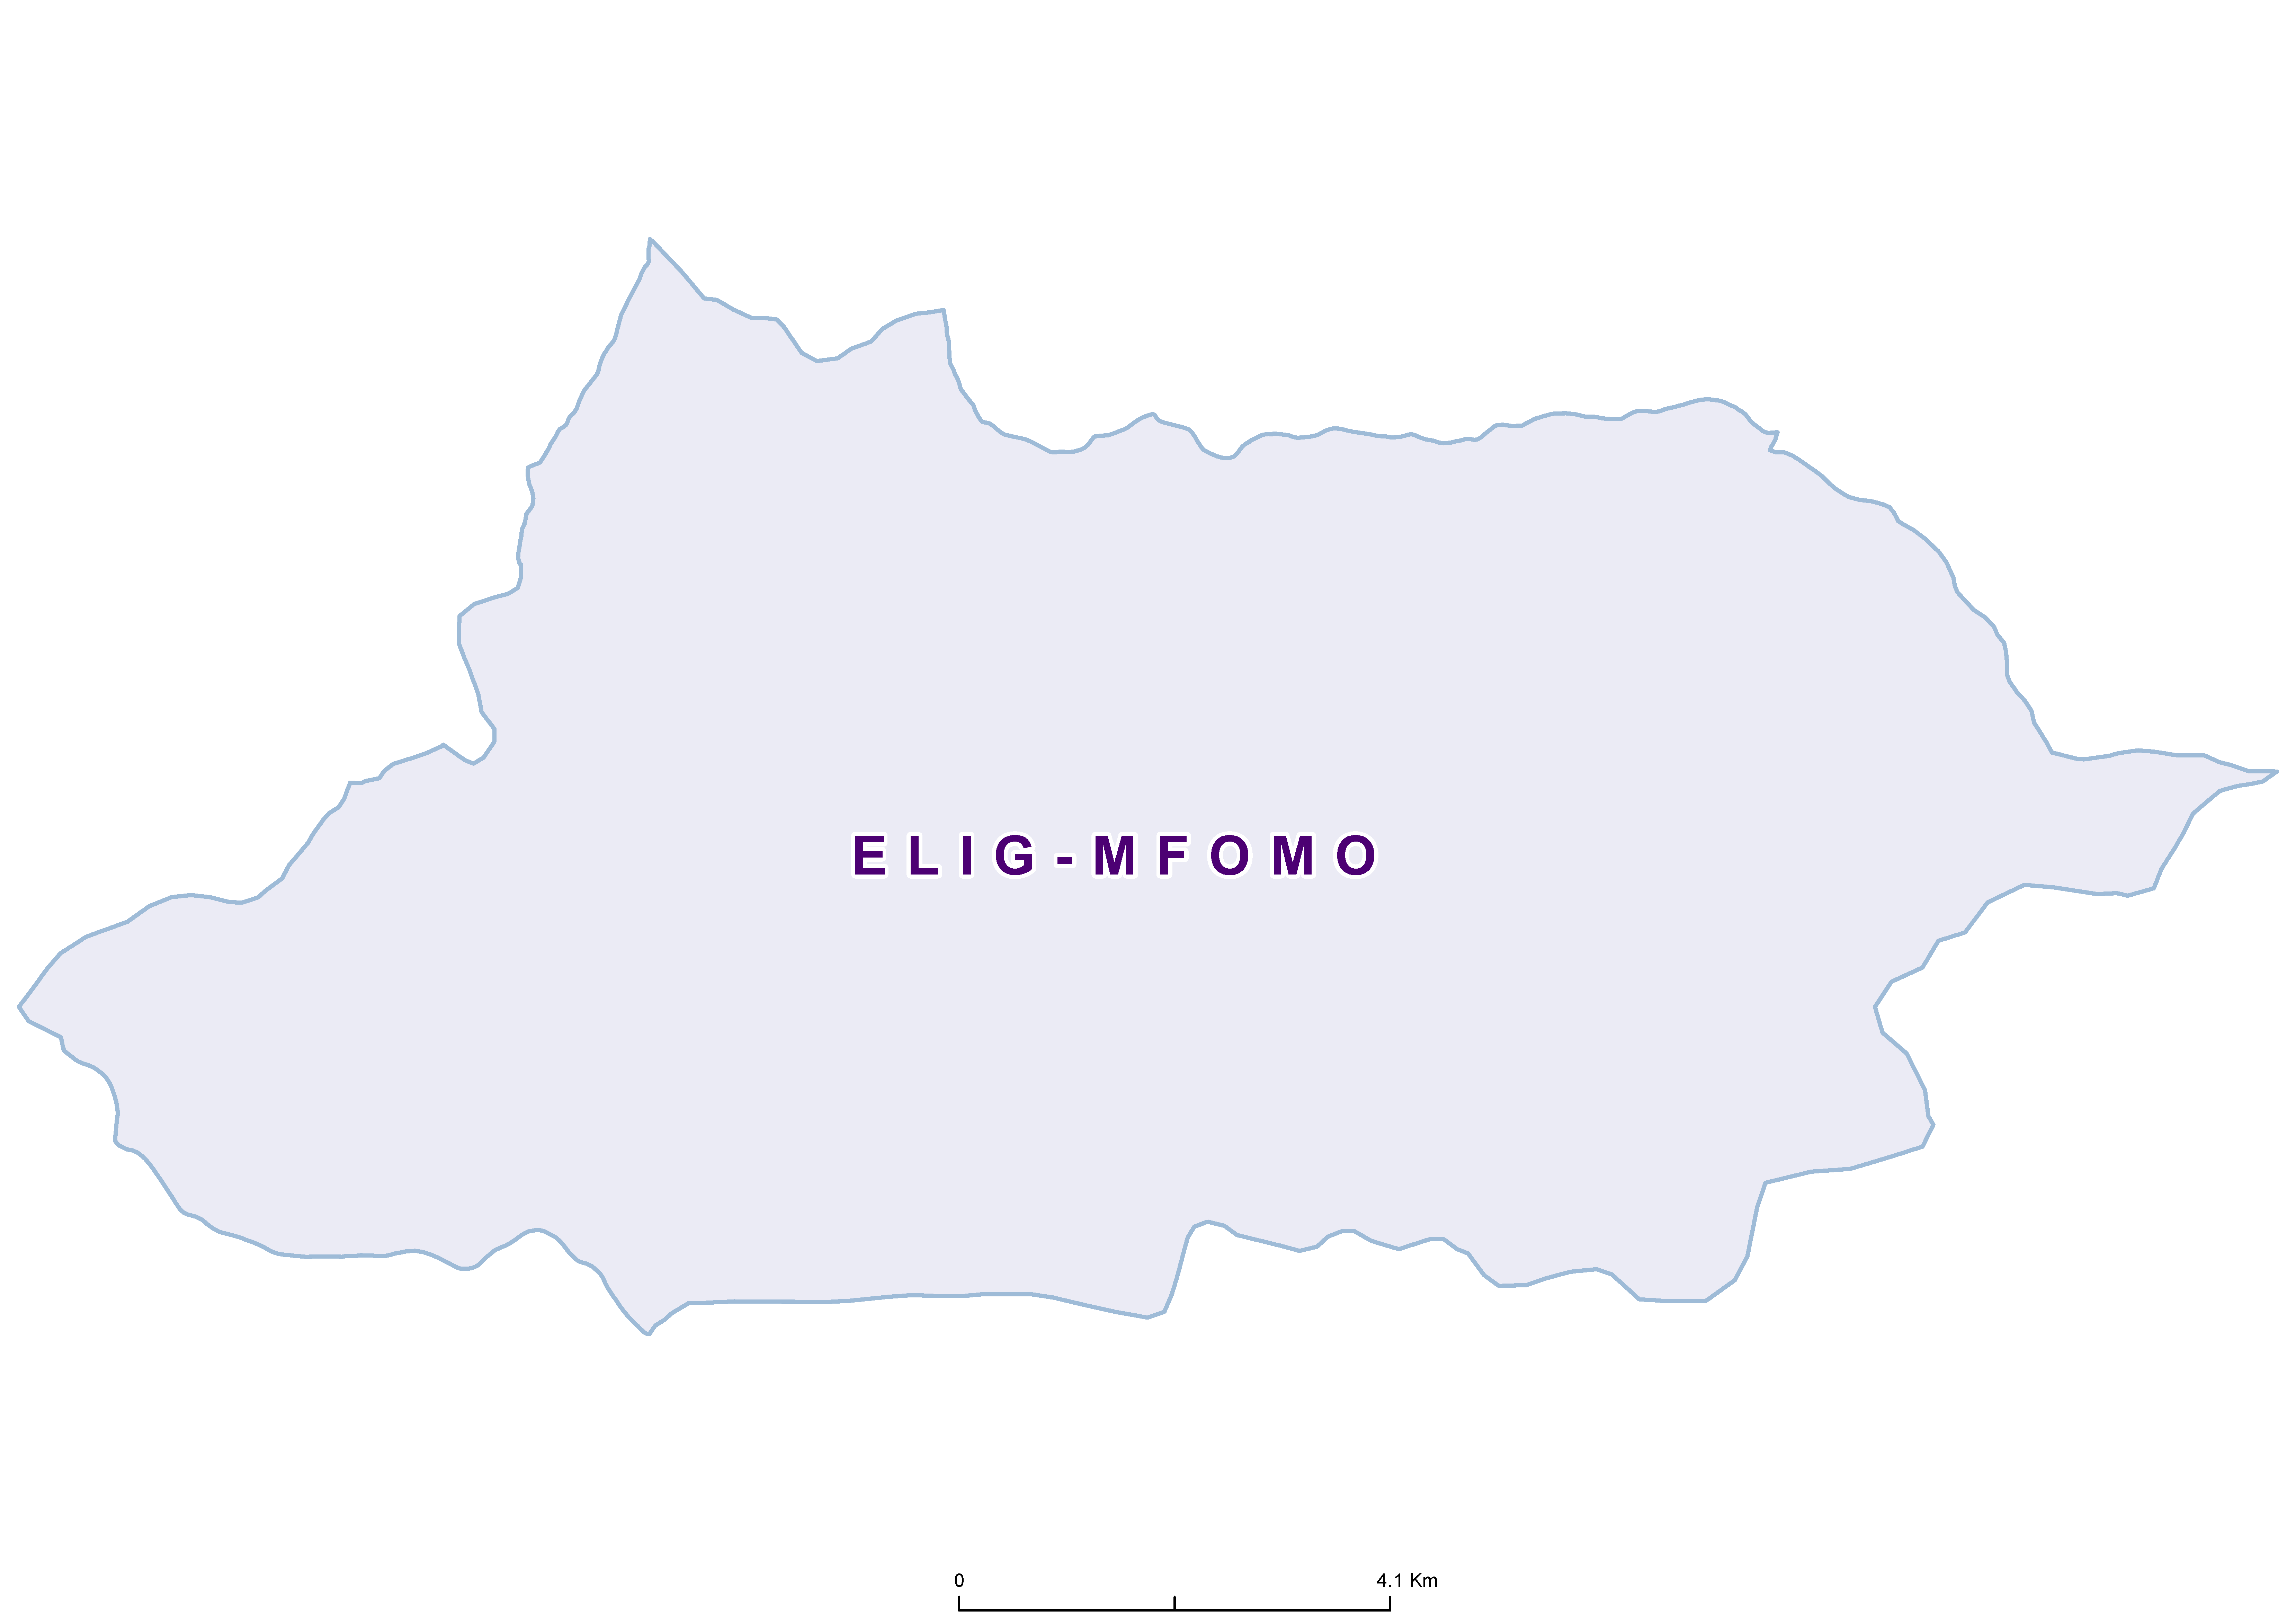 Elig-mfomo Max SCH 19850001